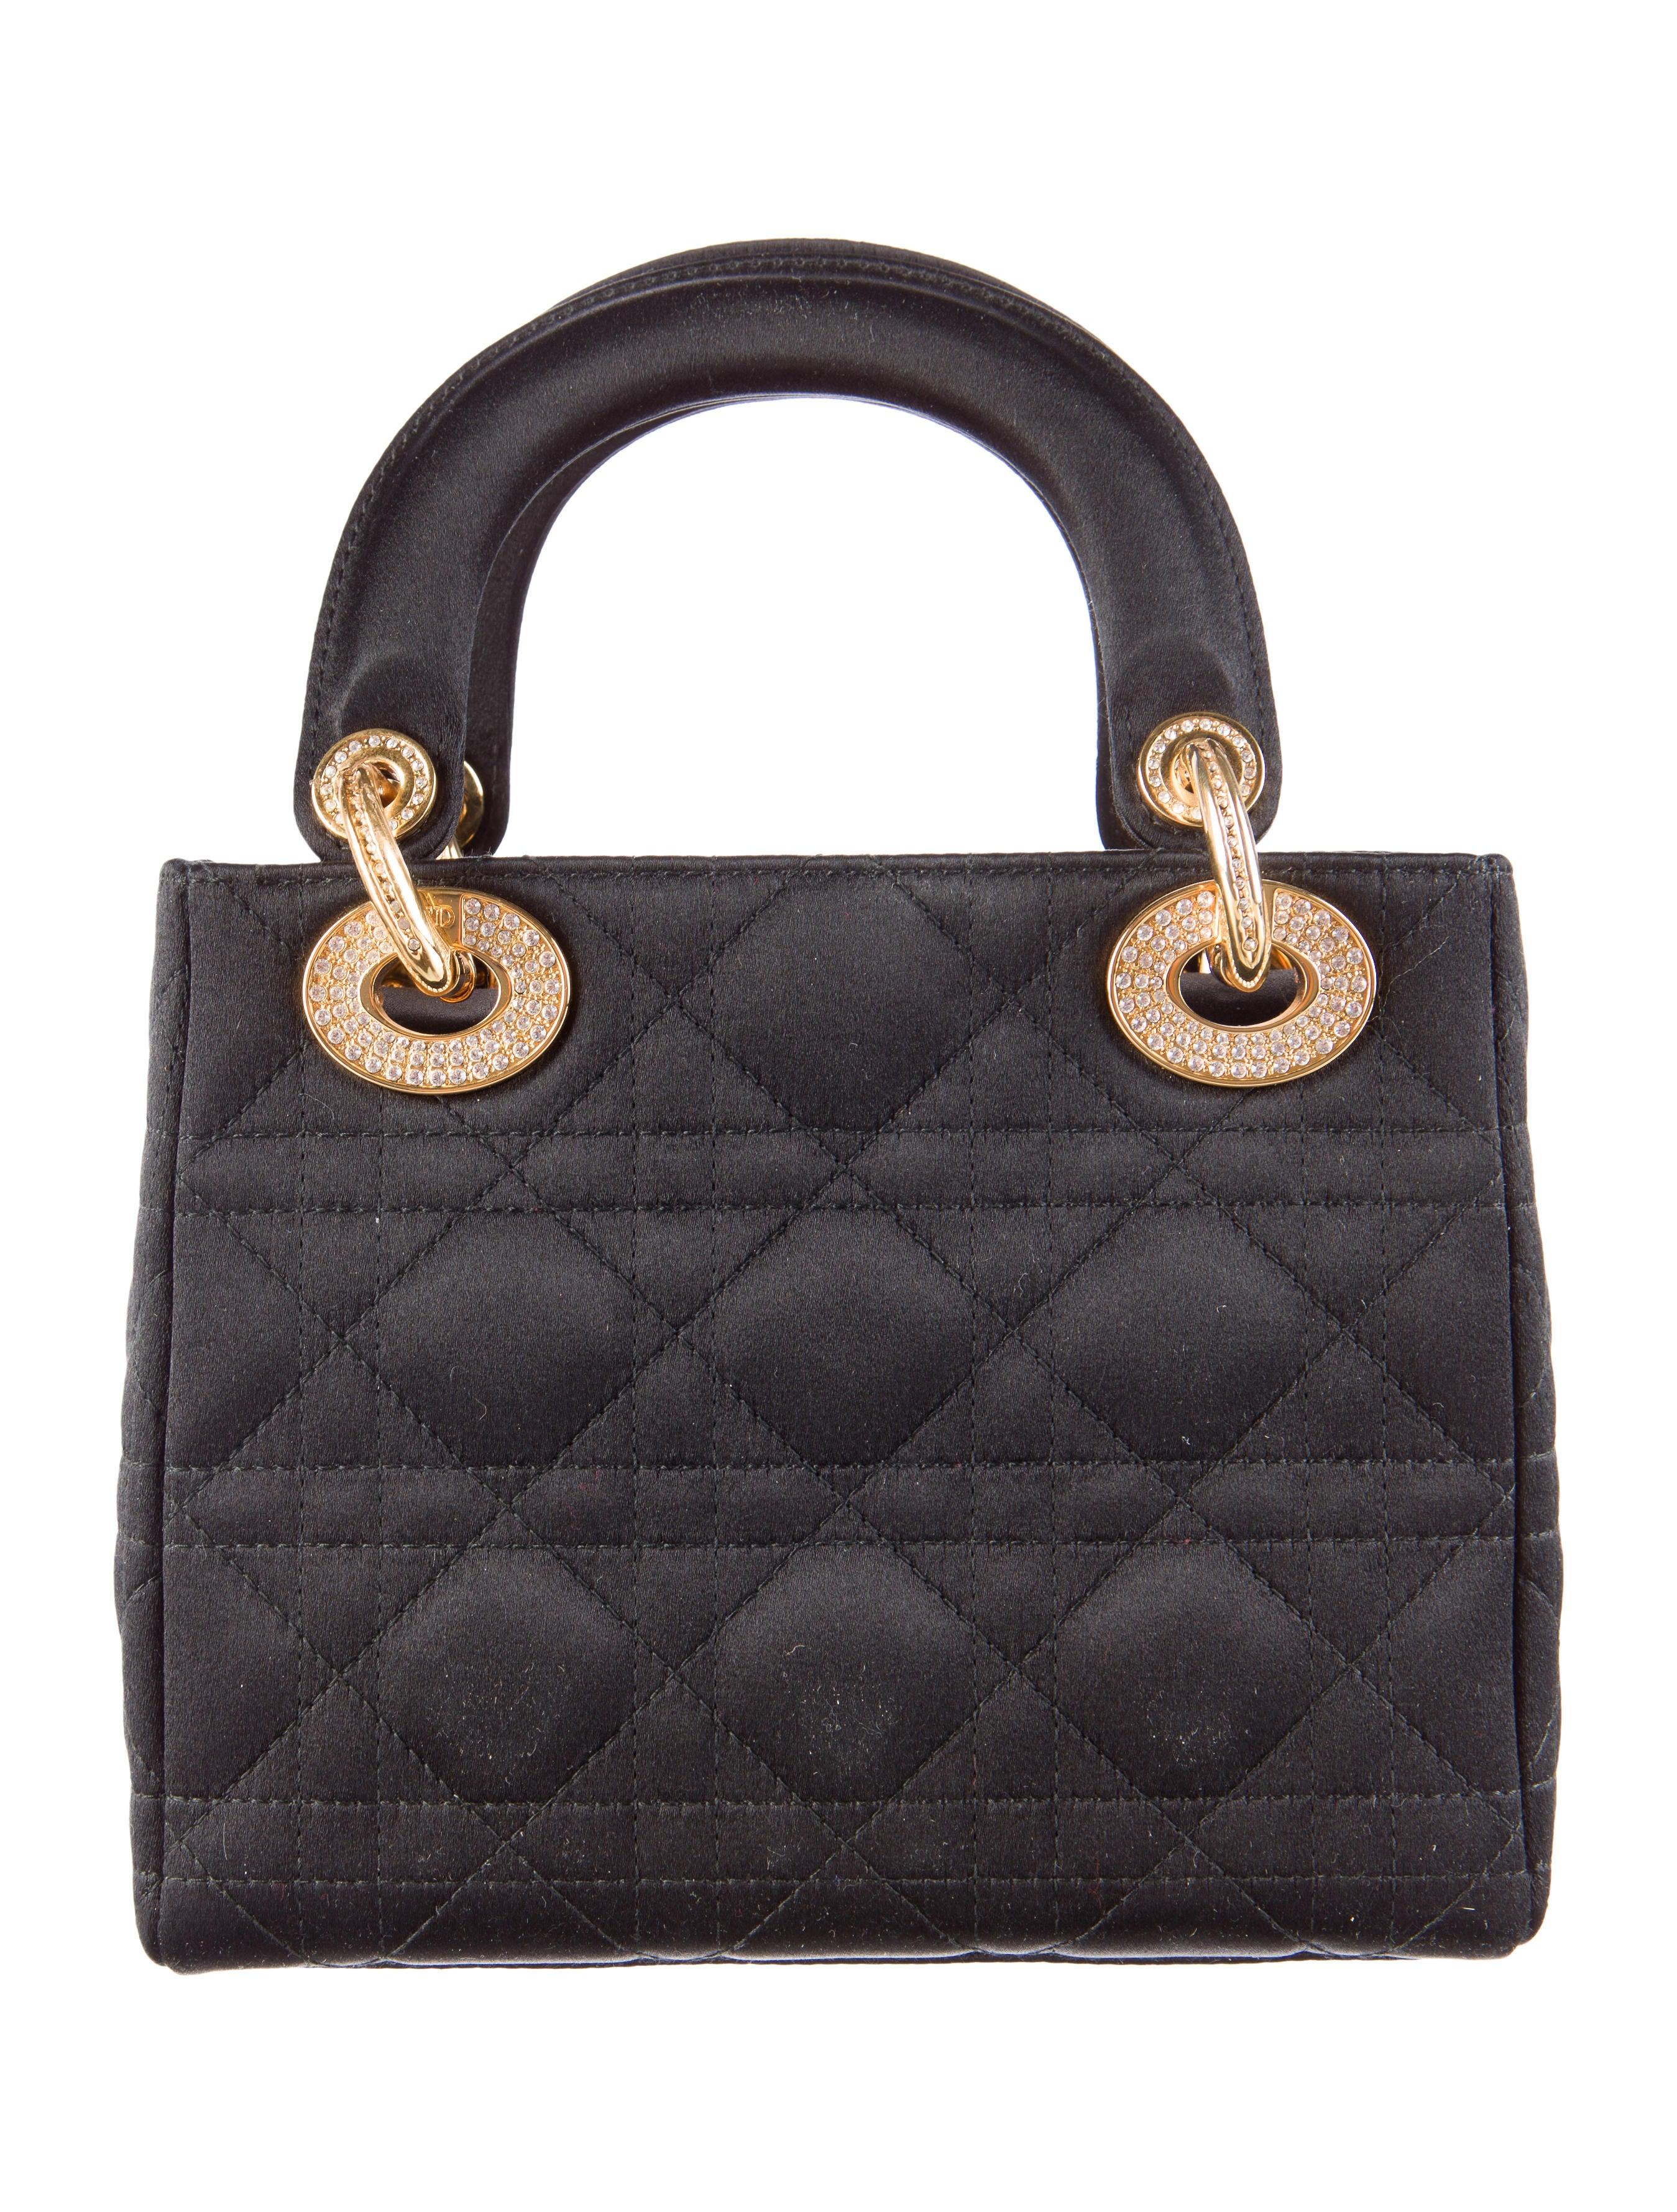 christian dior satin mini lady dior bag handbags chr41659 the realreal. Black Bedroom Furniture Sets. Home Design Ideas